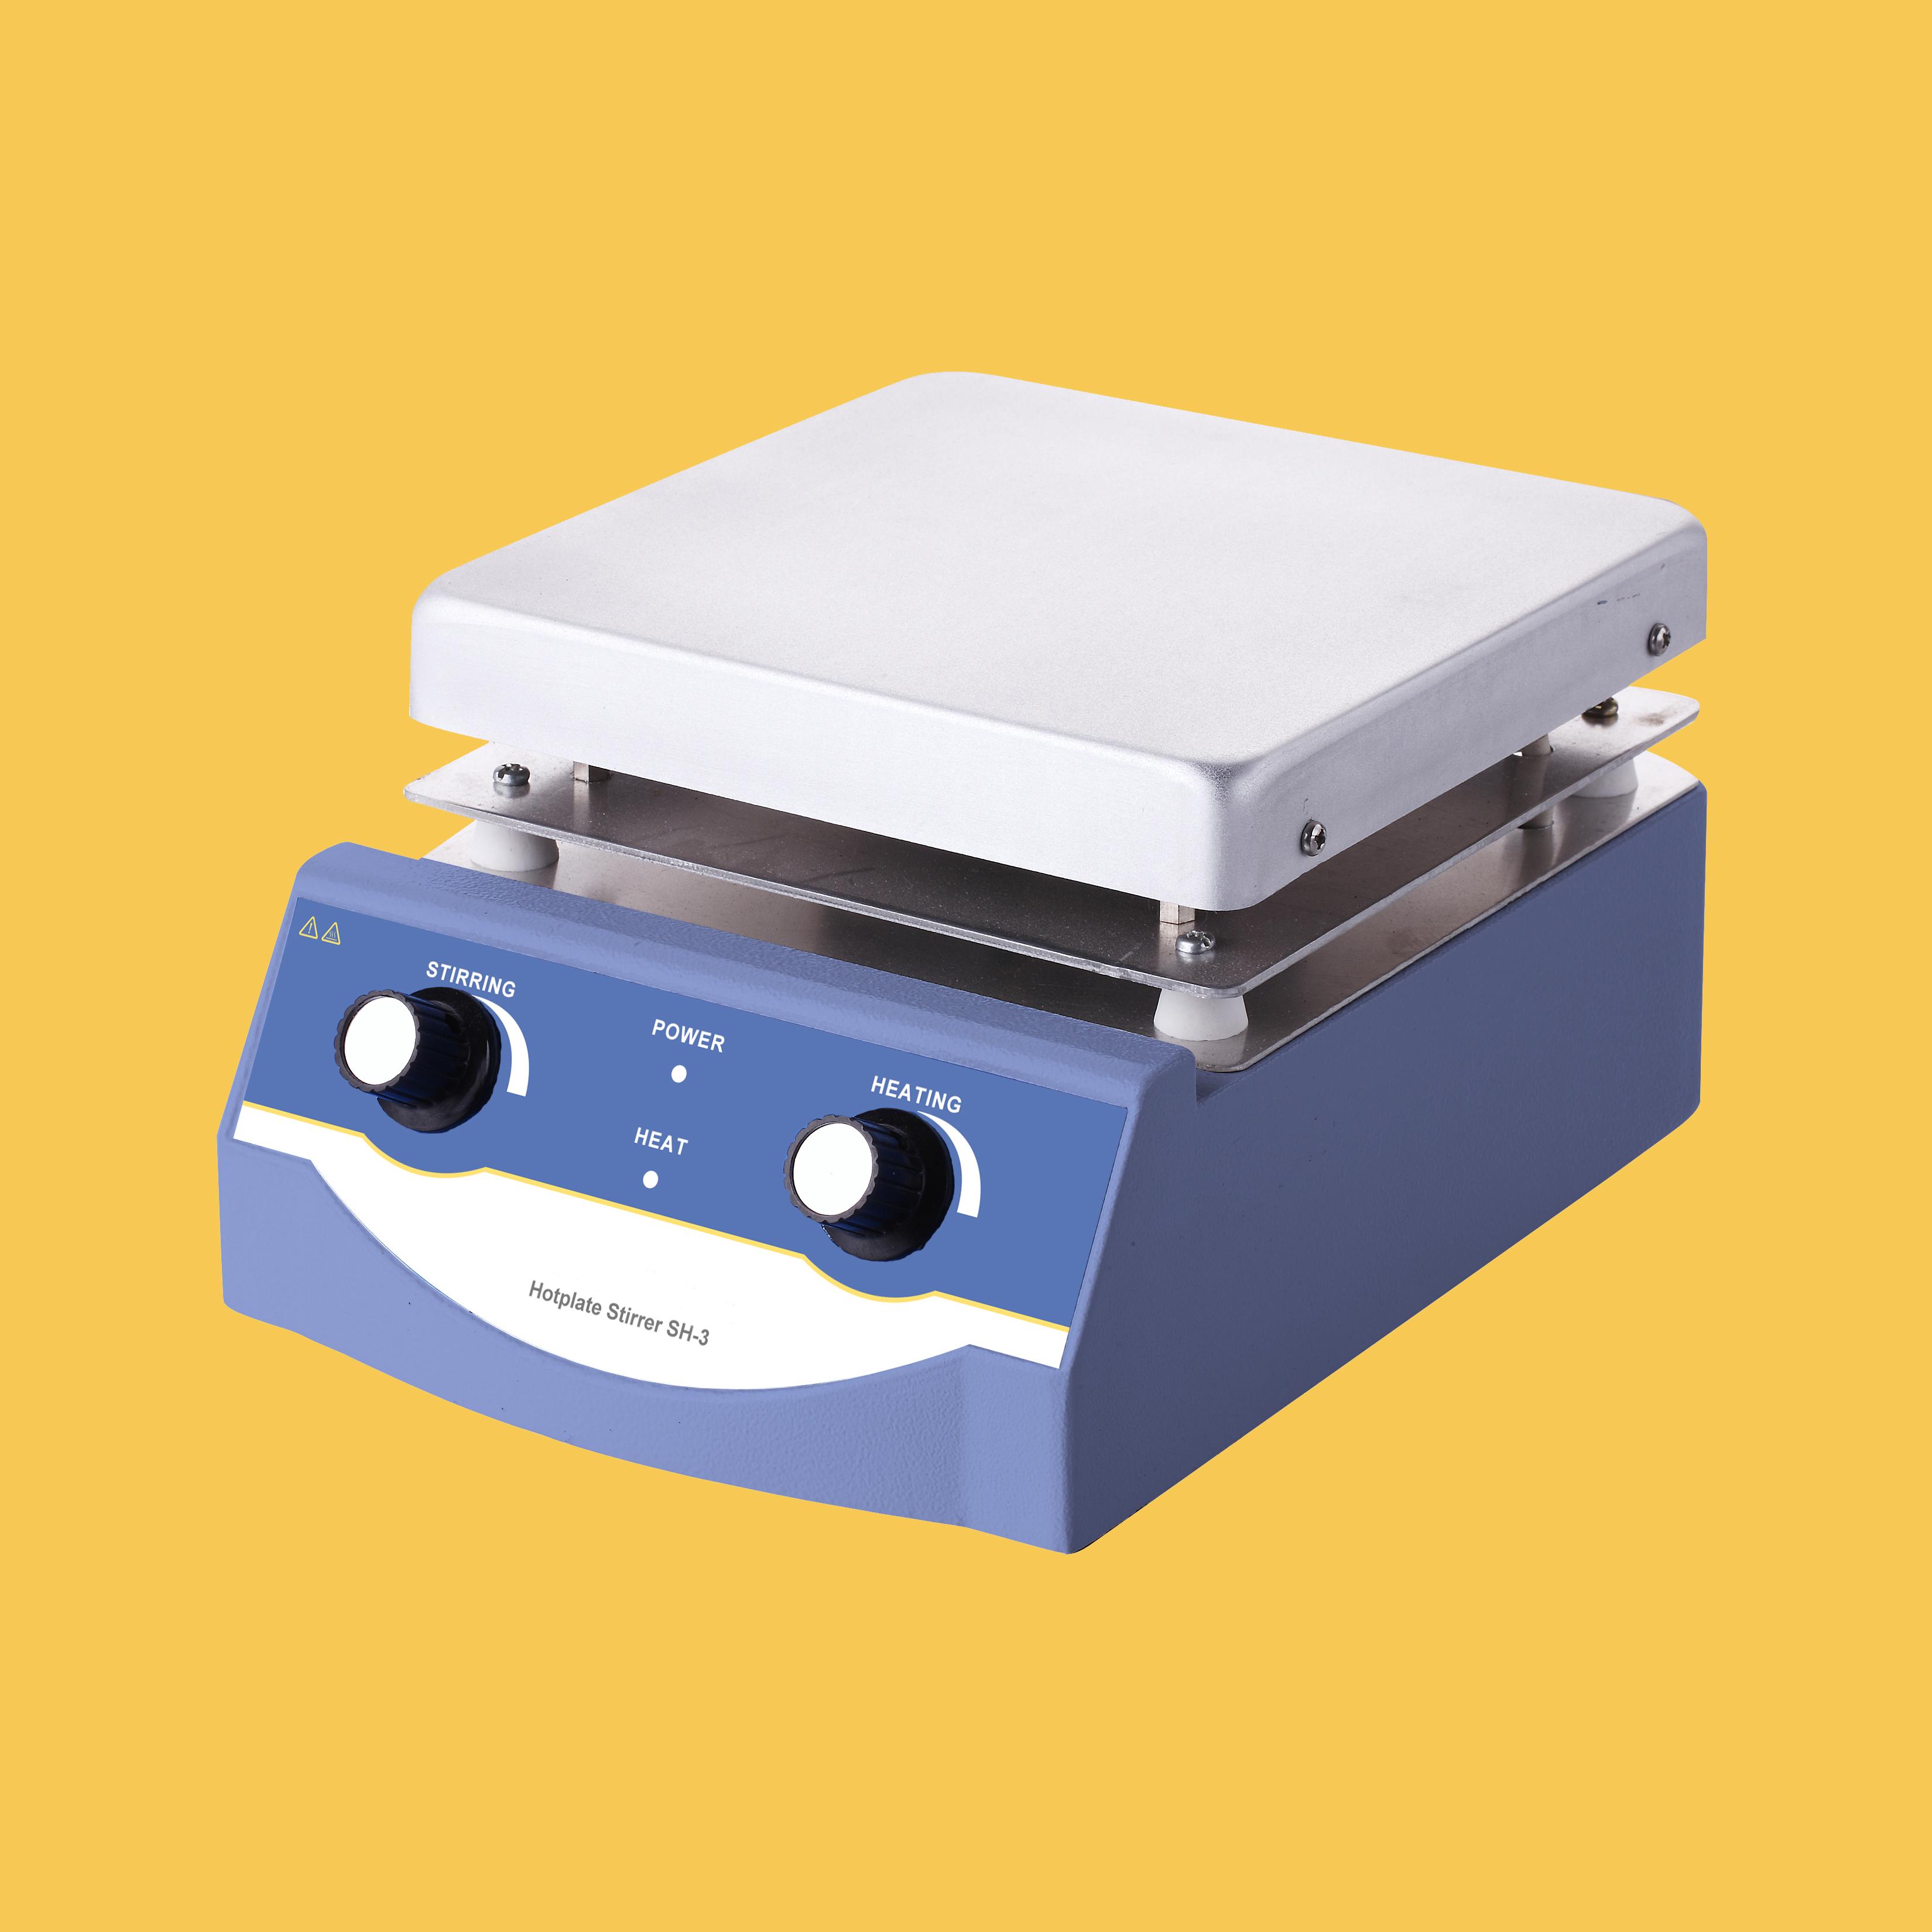 Magnetic Hotplates